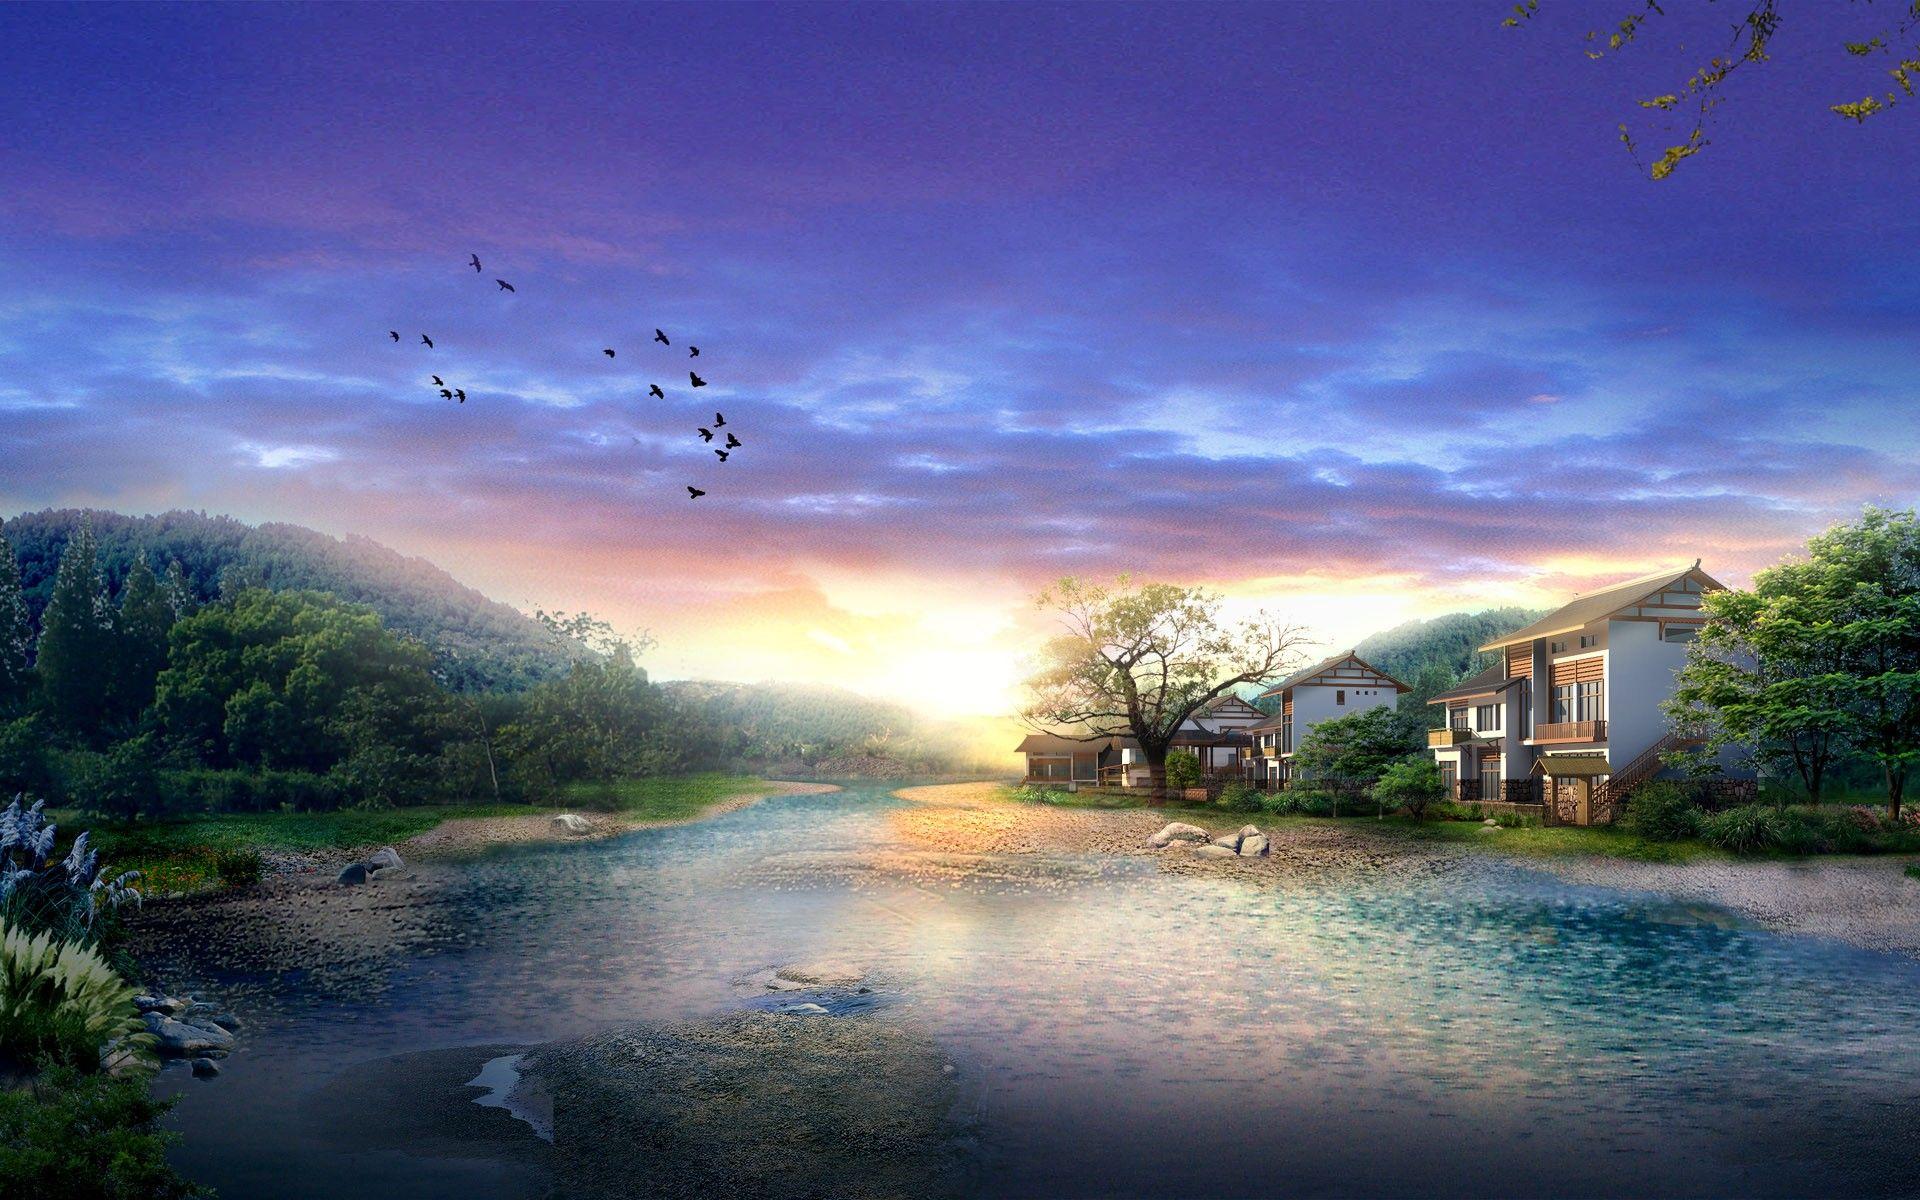 17 Gorgeous Cg Landscapes Of Japan Place 10 Scenery Wallpaper Beautiful Nature Wallpaper Landscape Wallpaper